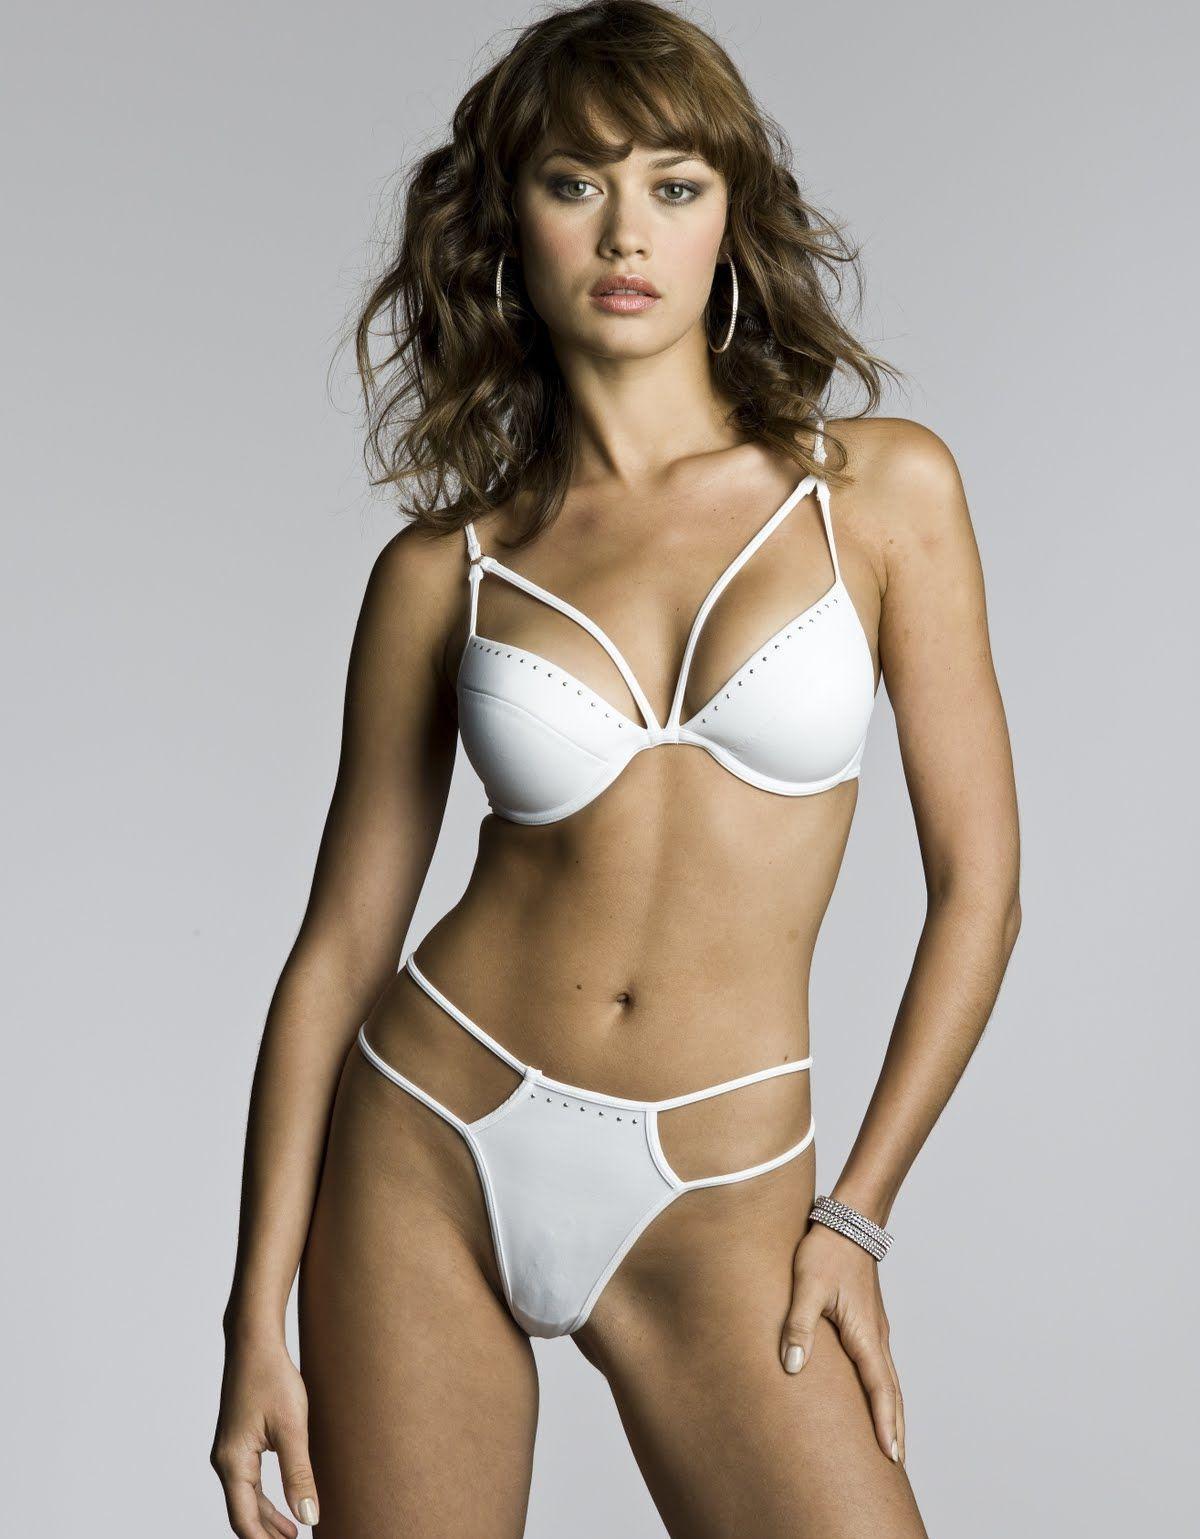 bikini Olga kurylenko